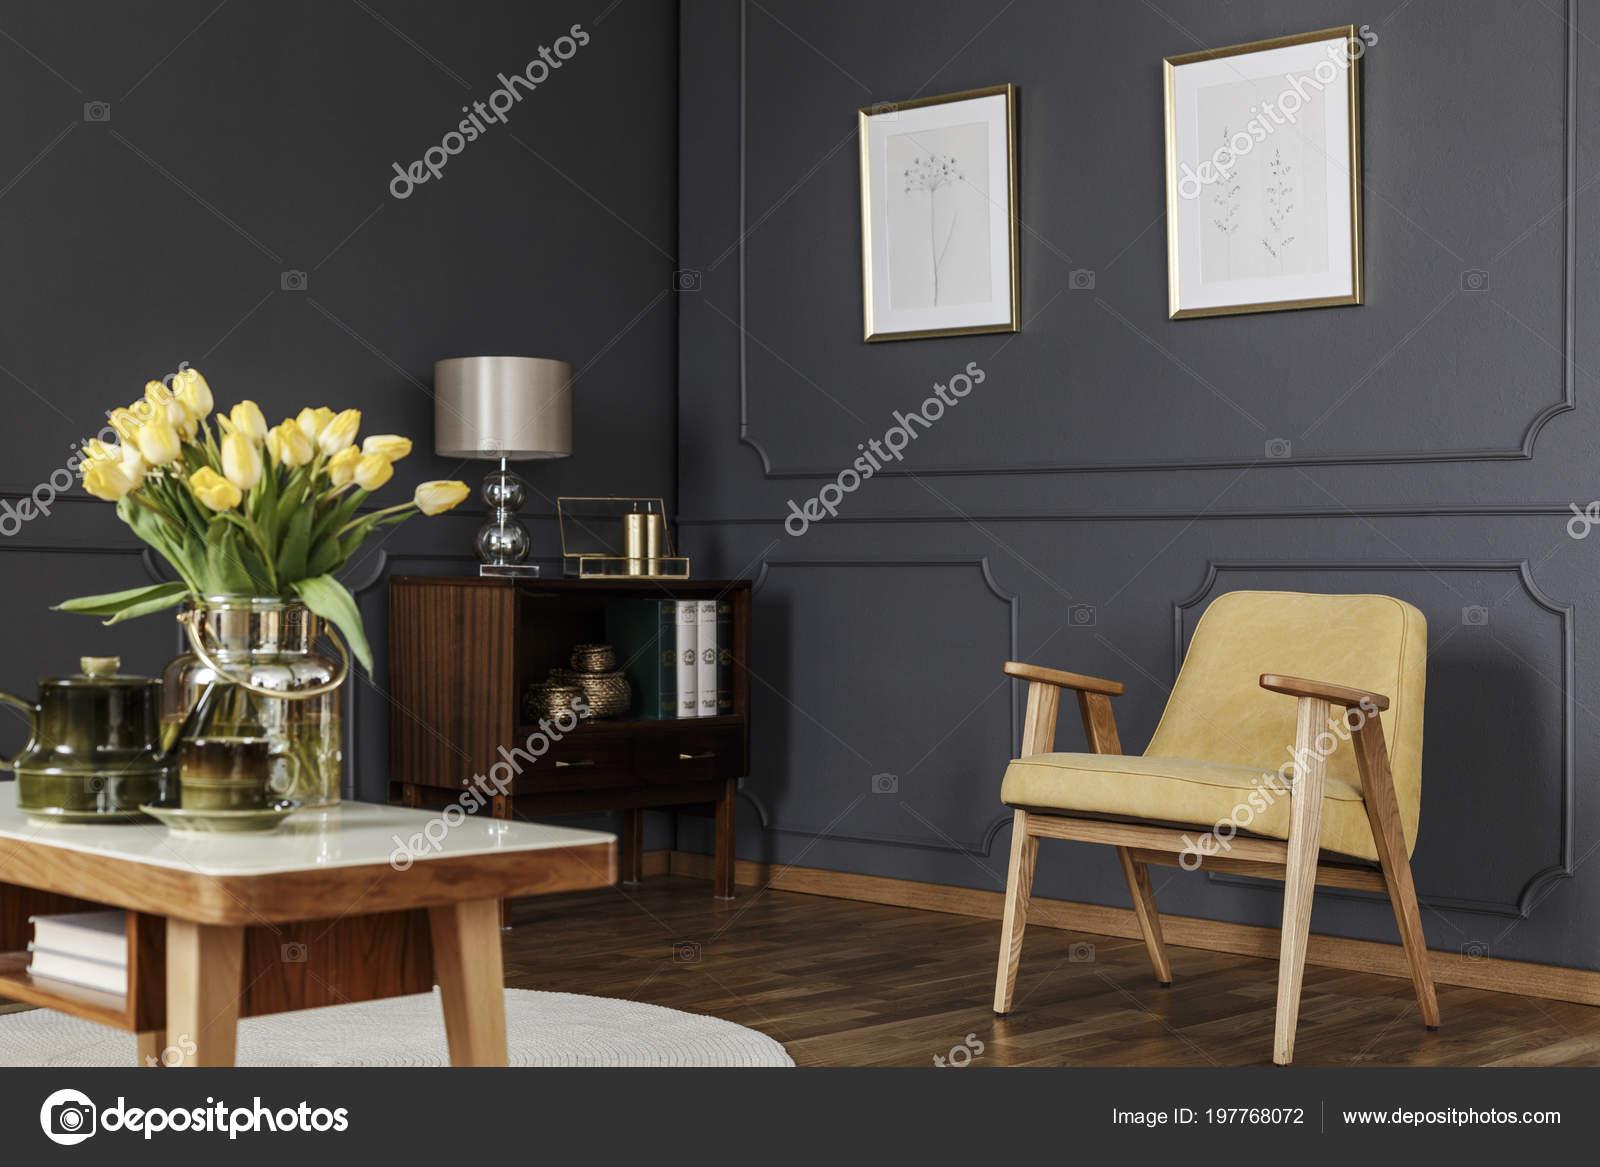 houten kast hoek van een donkere woonkamer interieur met lambrisering stockfoto